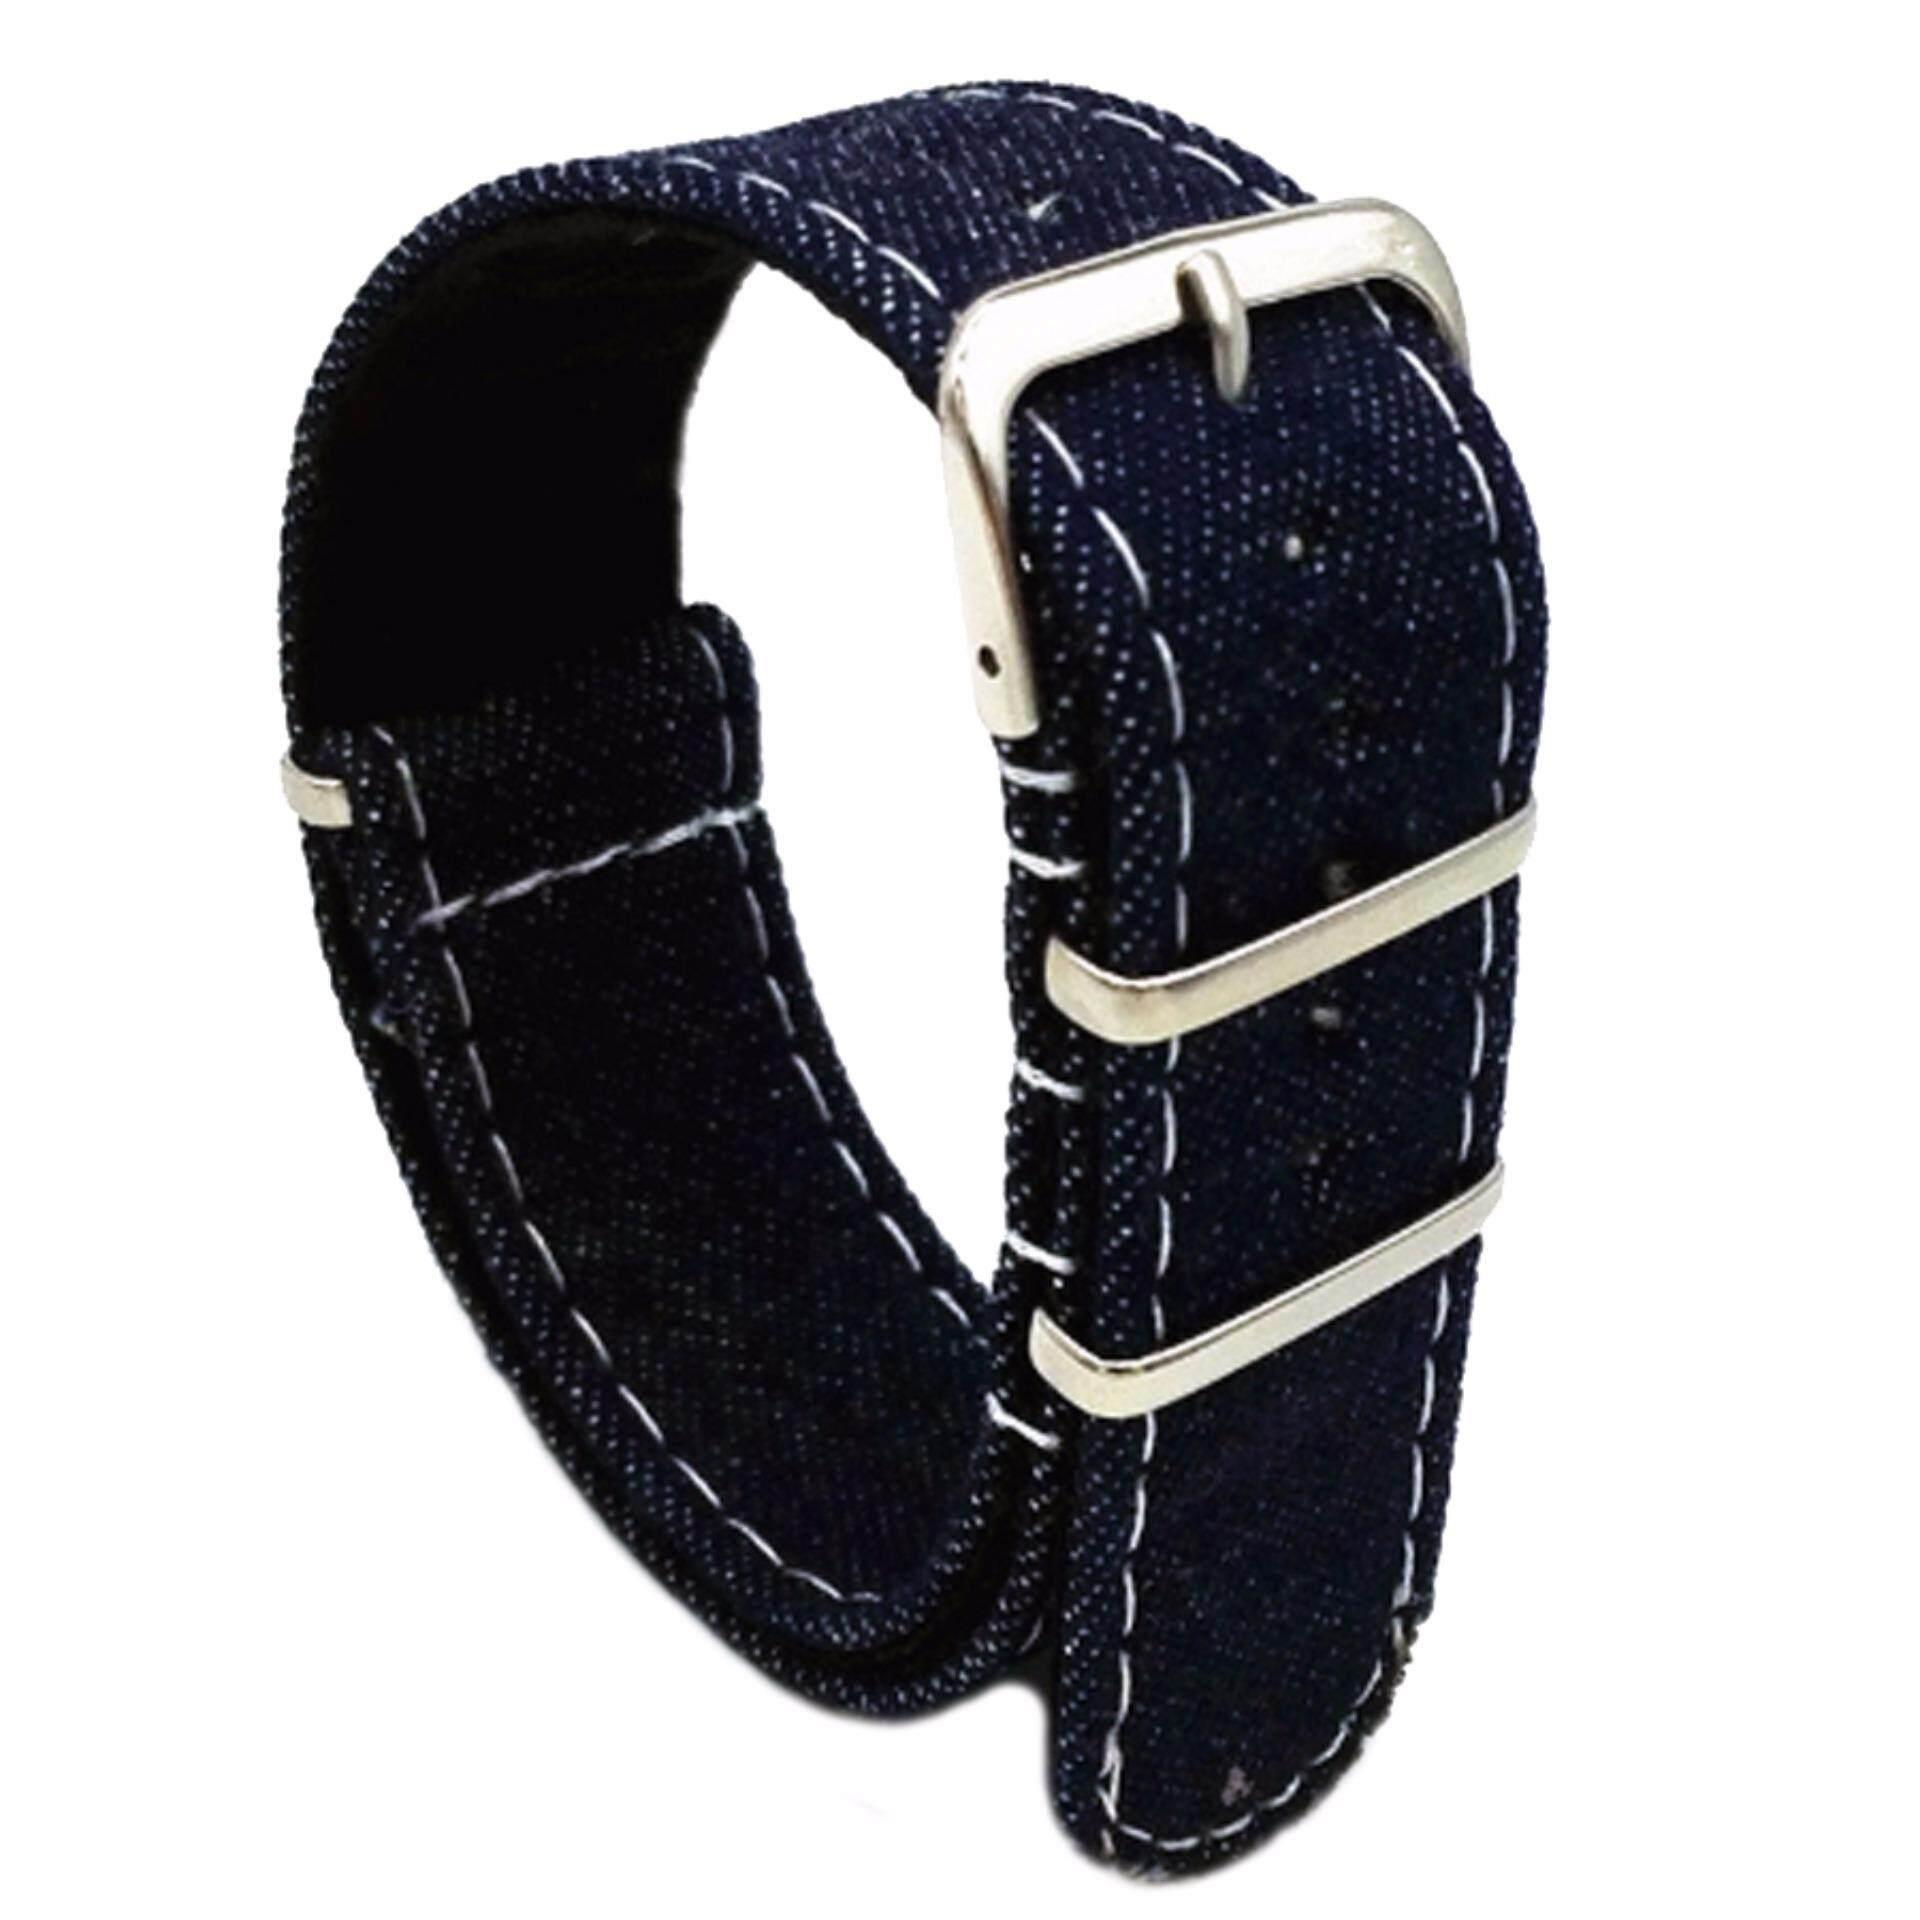 Twinklenorth 20mm Dark Blue Denim Nato Strap Nylon Military Watch Band Strap Watchband NATO-035